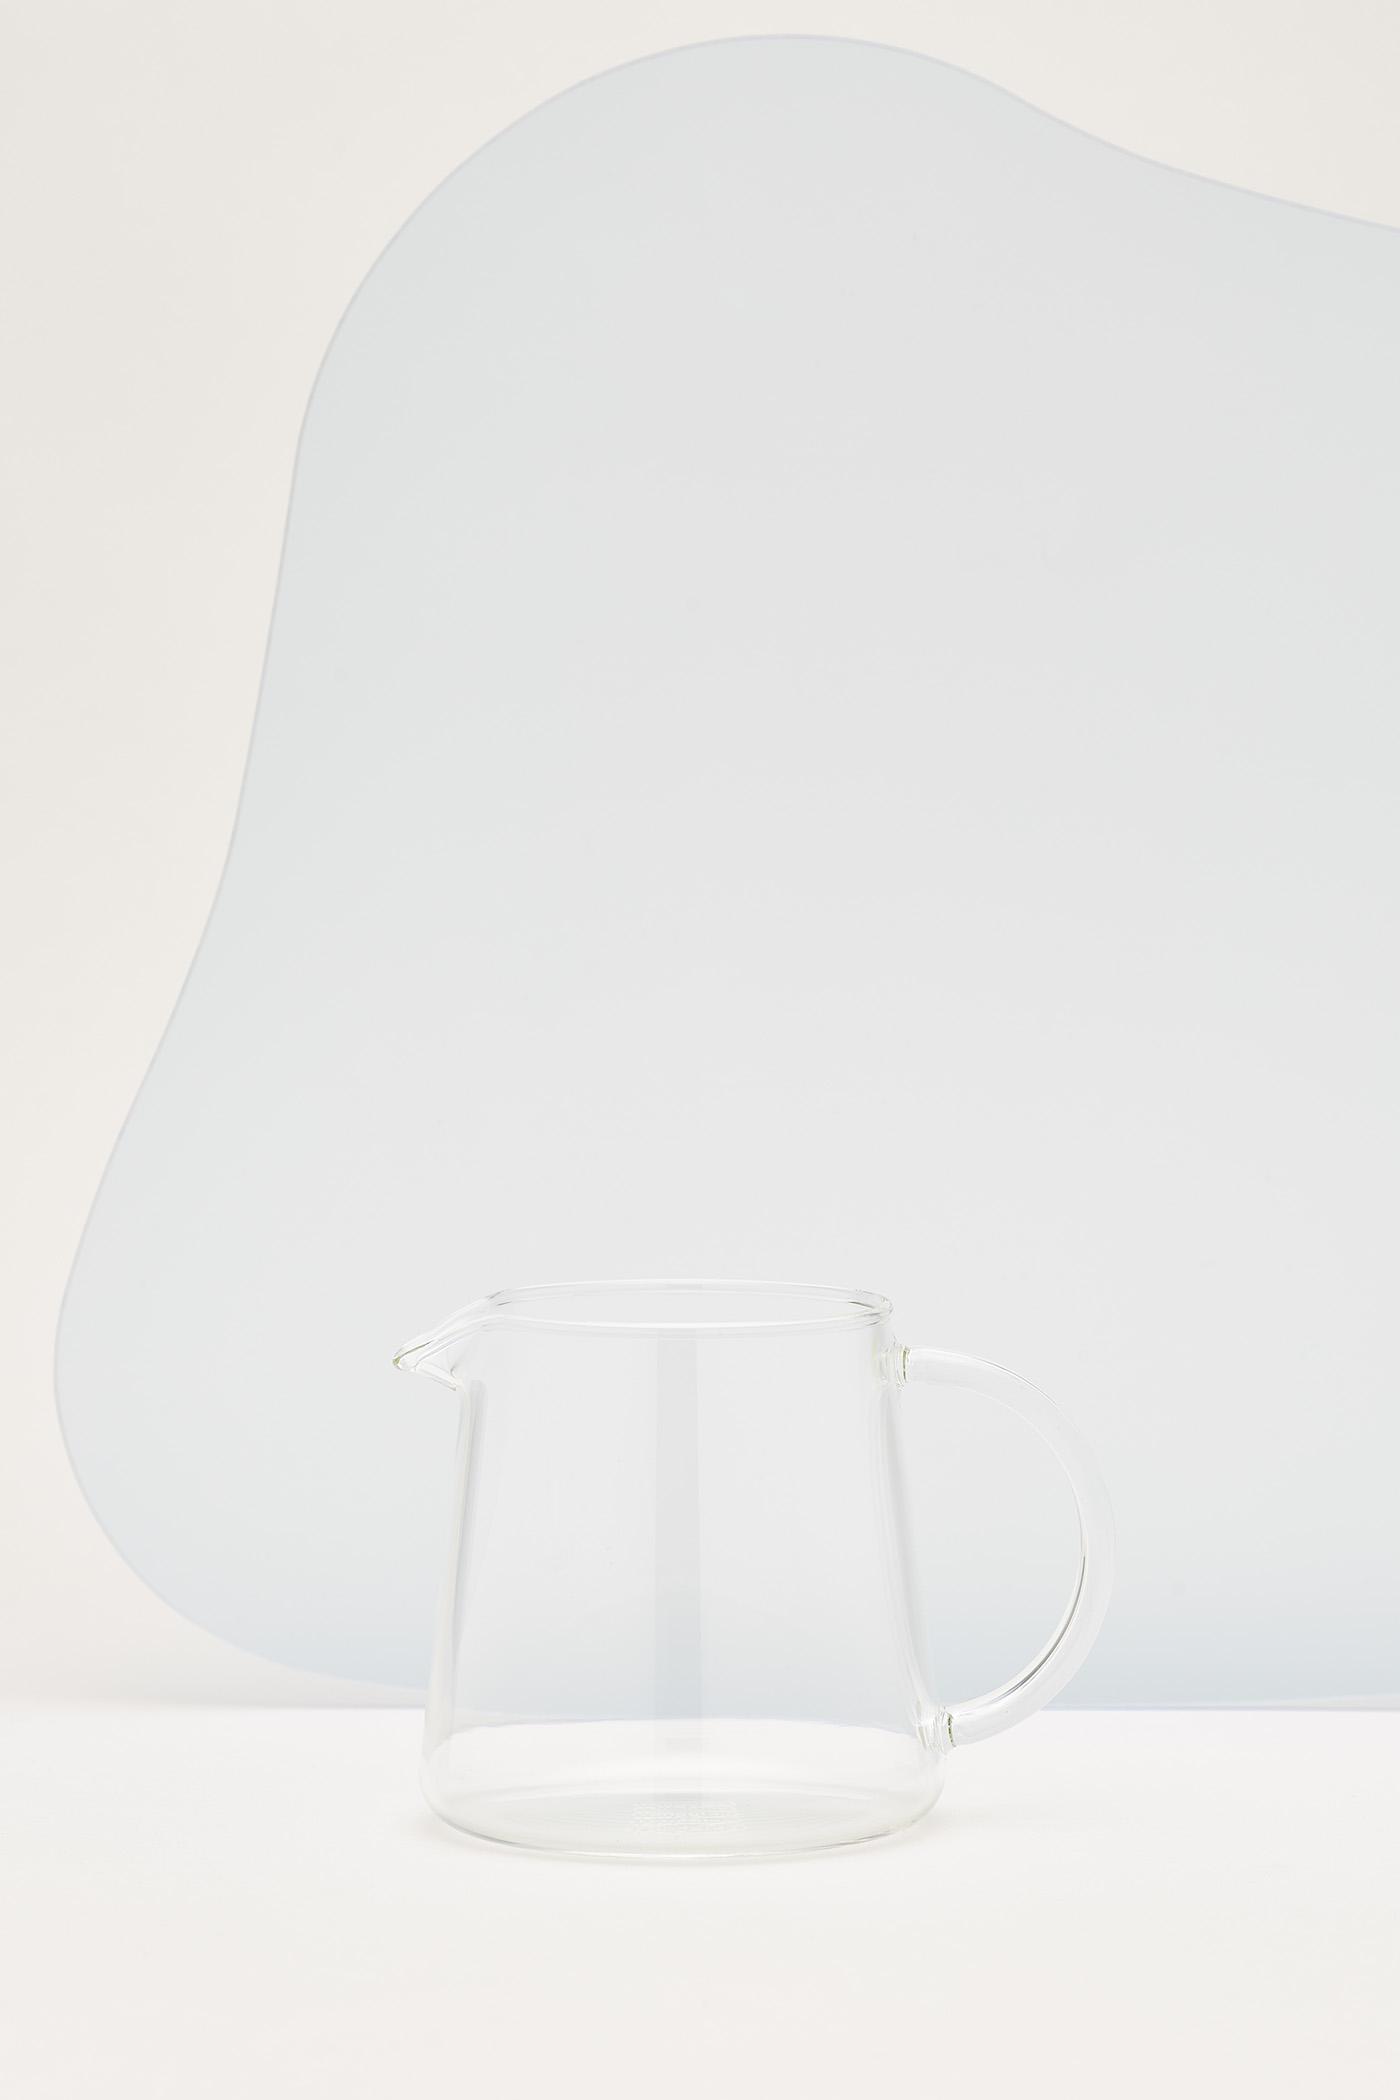 Trendglas For Two Pot